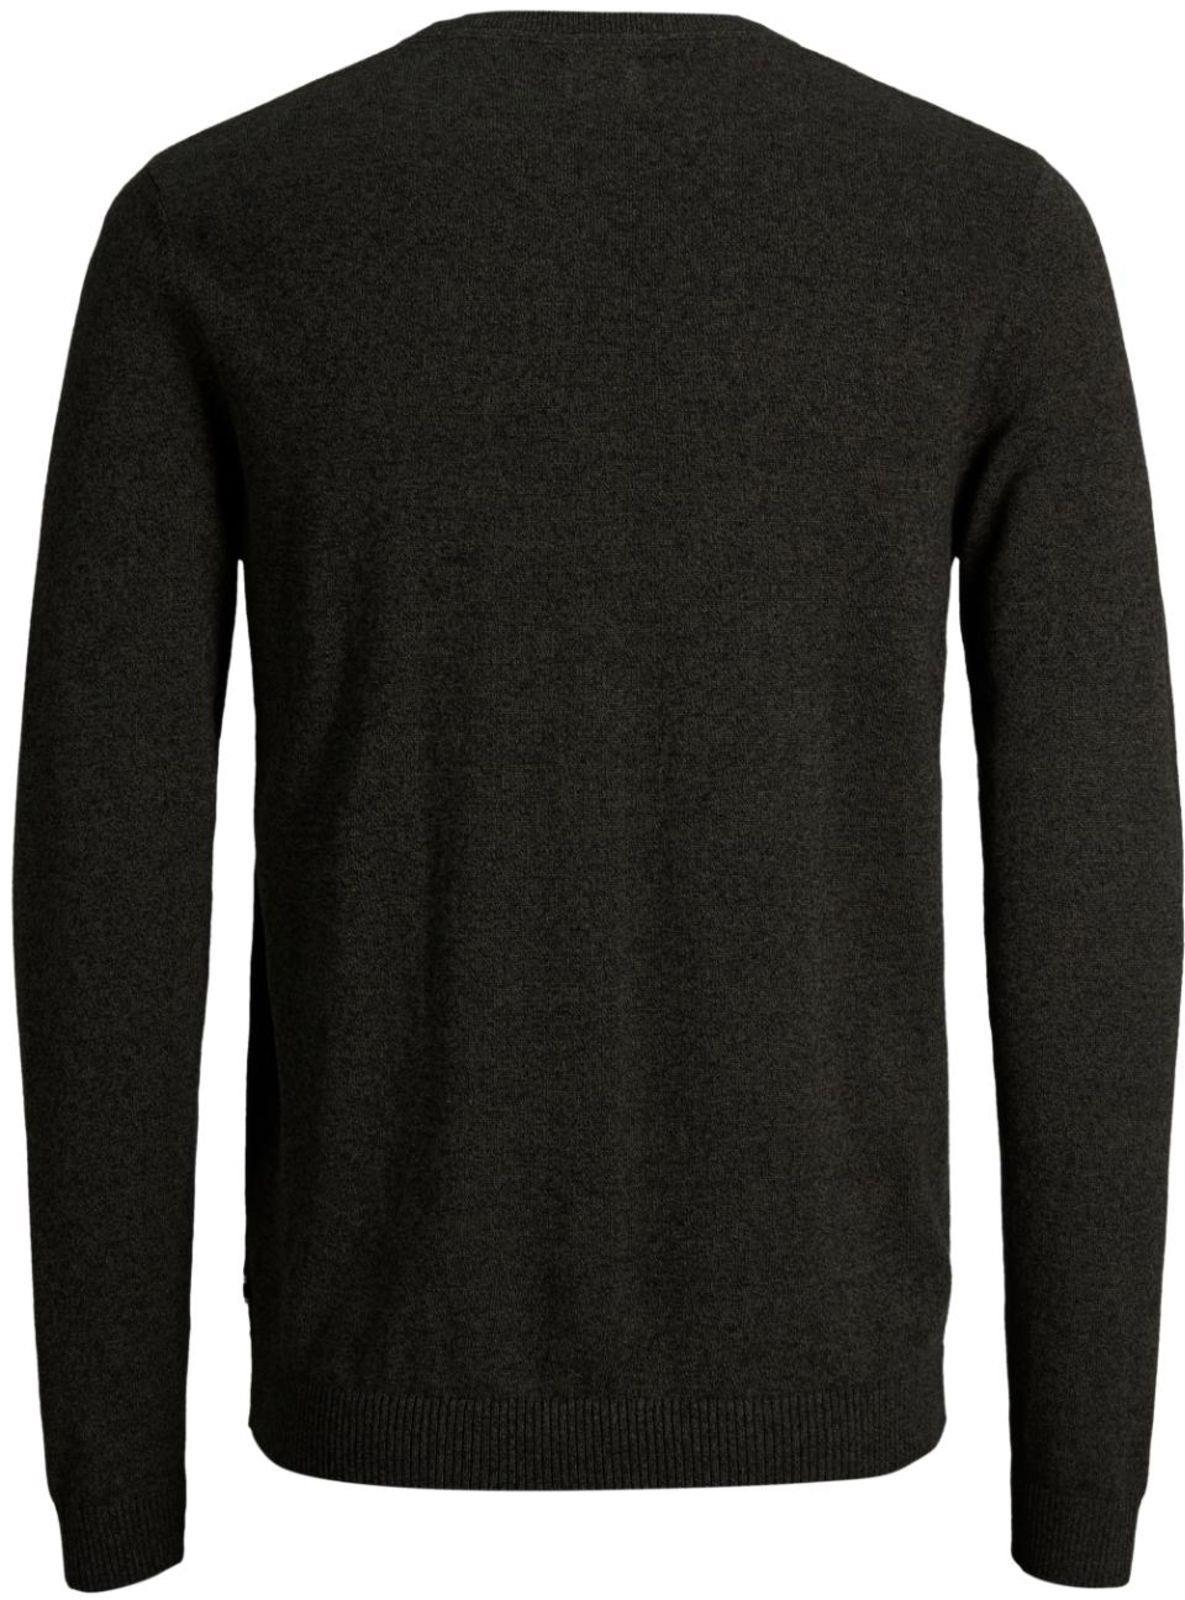 Jack-amp-Jones-Jumpers-Sweaters-Cardigans-Assorted-S-XXL miniatuur 5